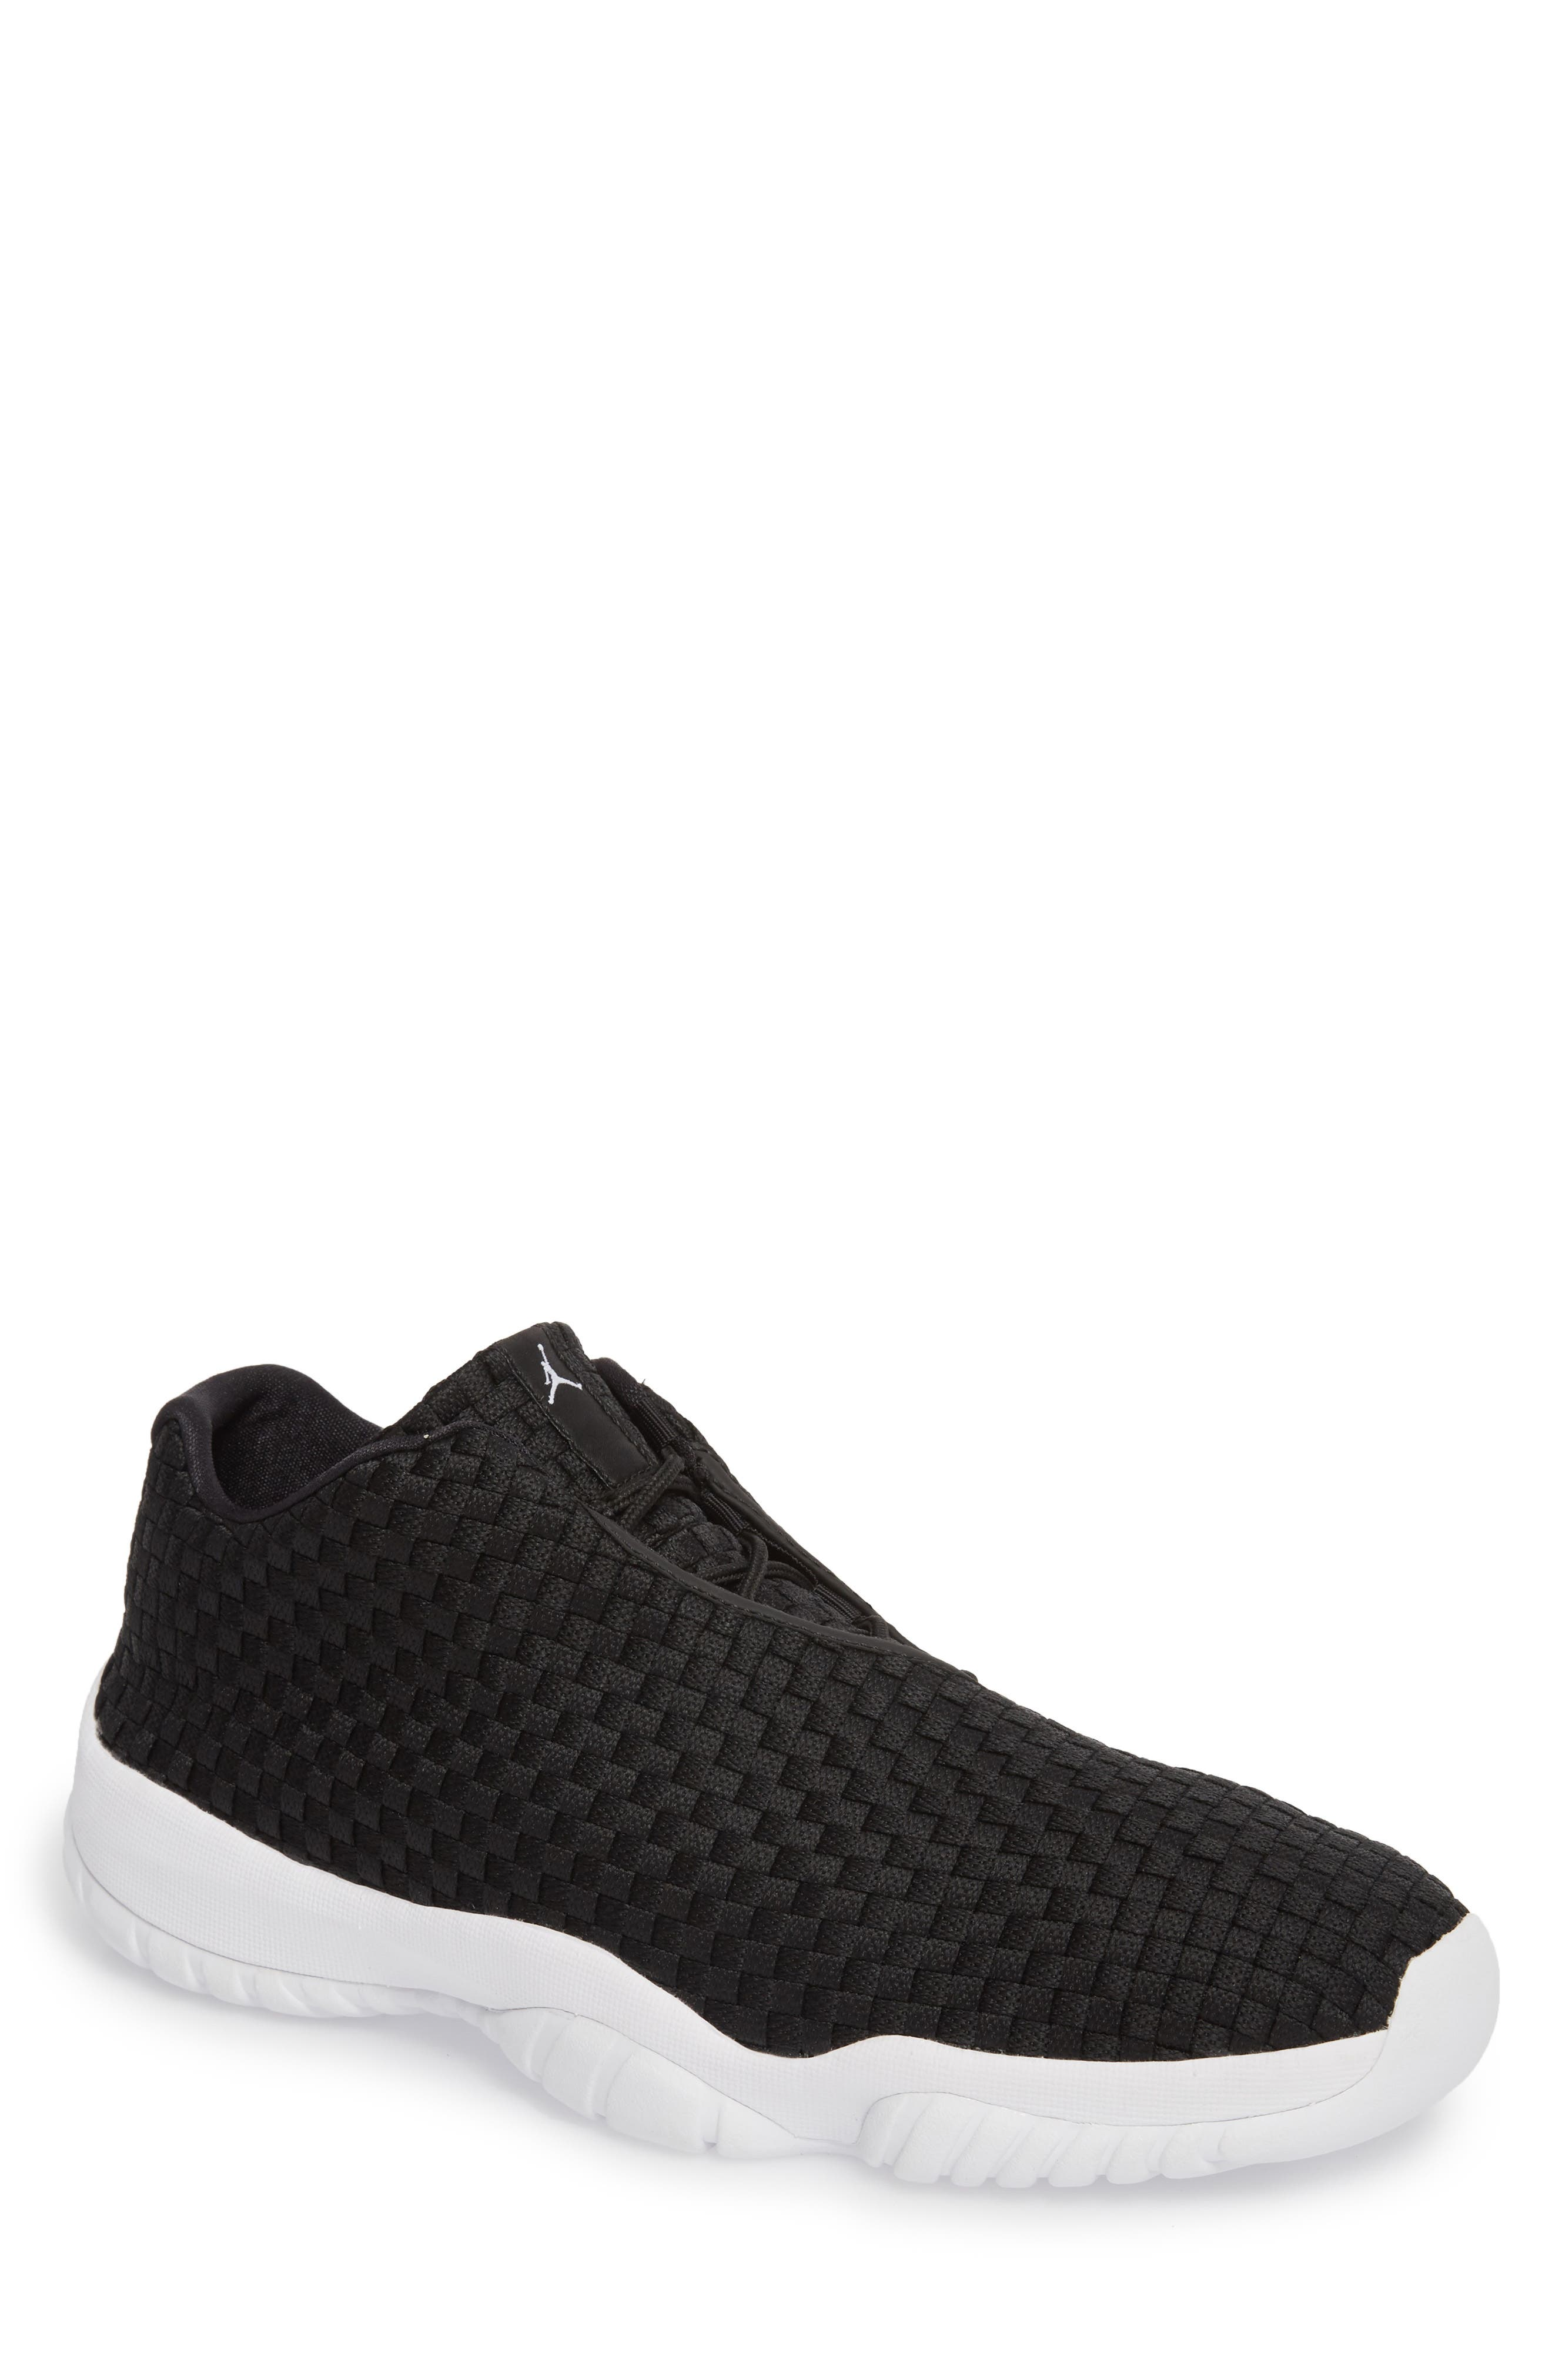 Air Jordan Future Woven Sneaker,                         Main,                         color, 002